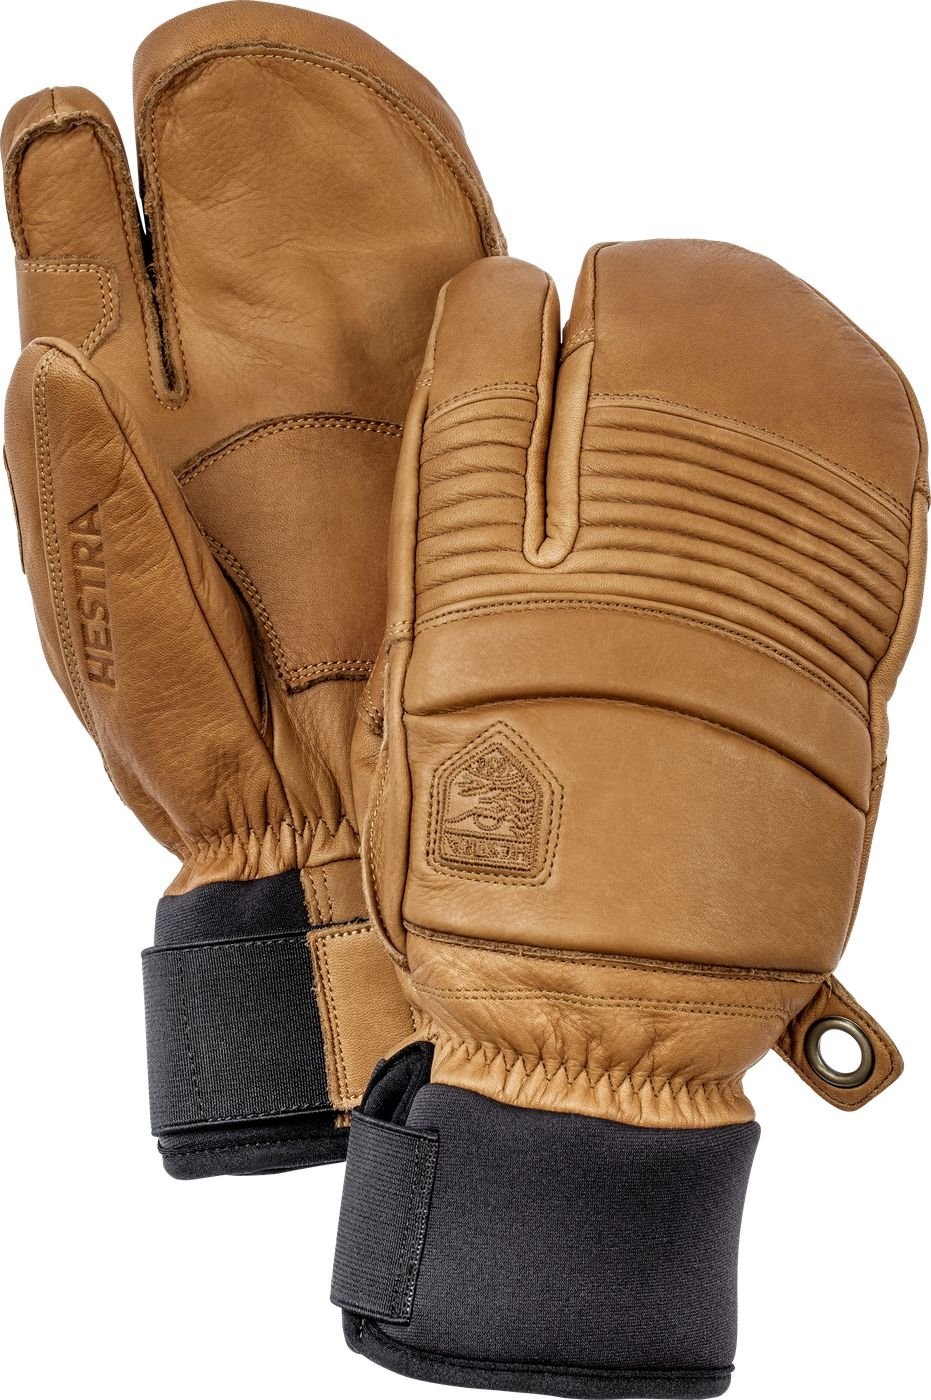 Hestra Mens Ski Gloves: Fall Line Winter Cold Weather Leather 3-Finger Mittens, Cork, 8